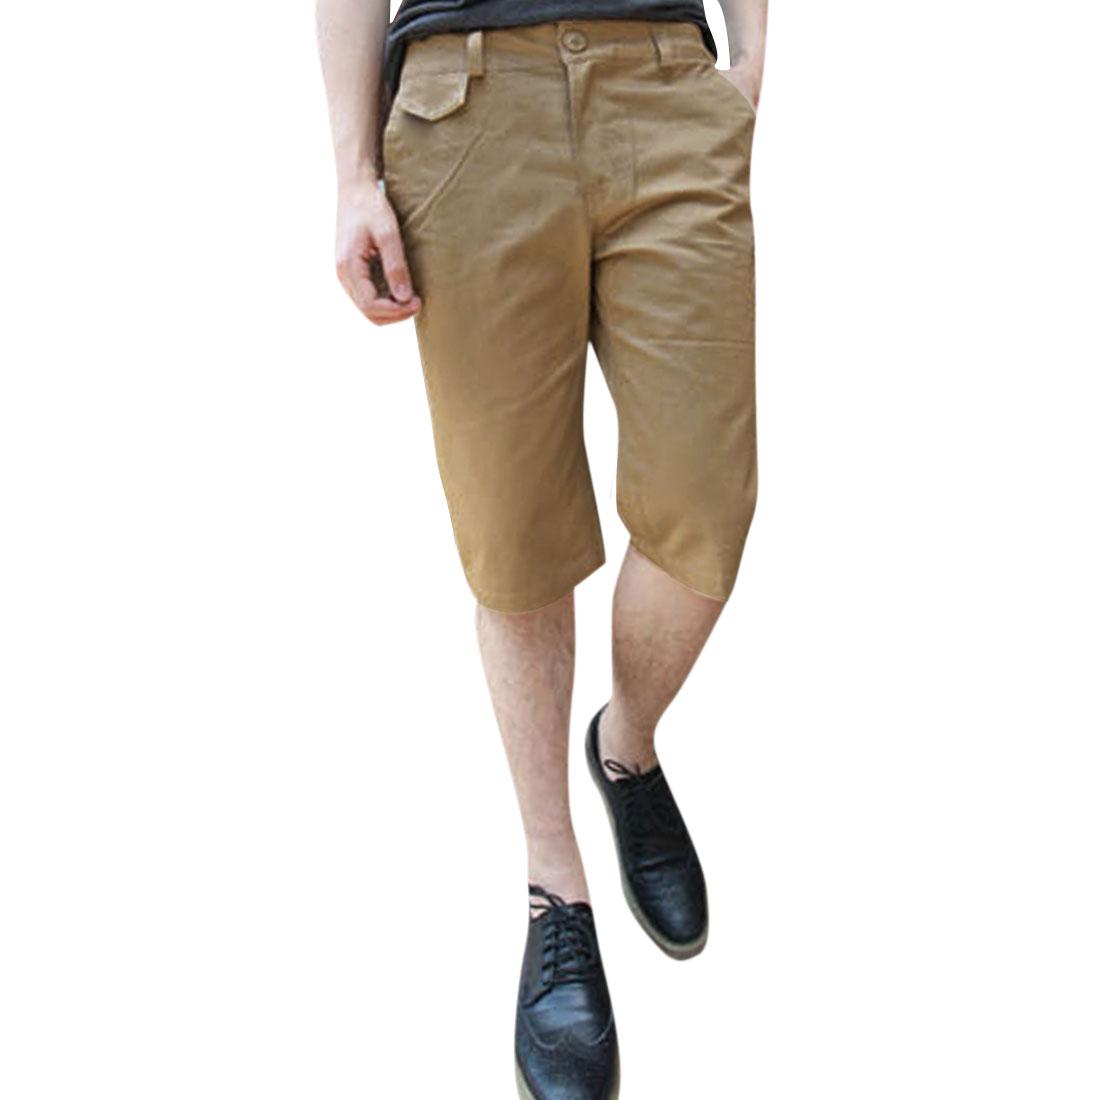 Men Up Buttoned Closure Zipper Fly Hip Pockets Shorts Khaki W36